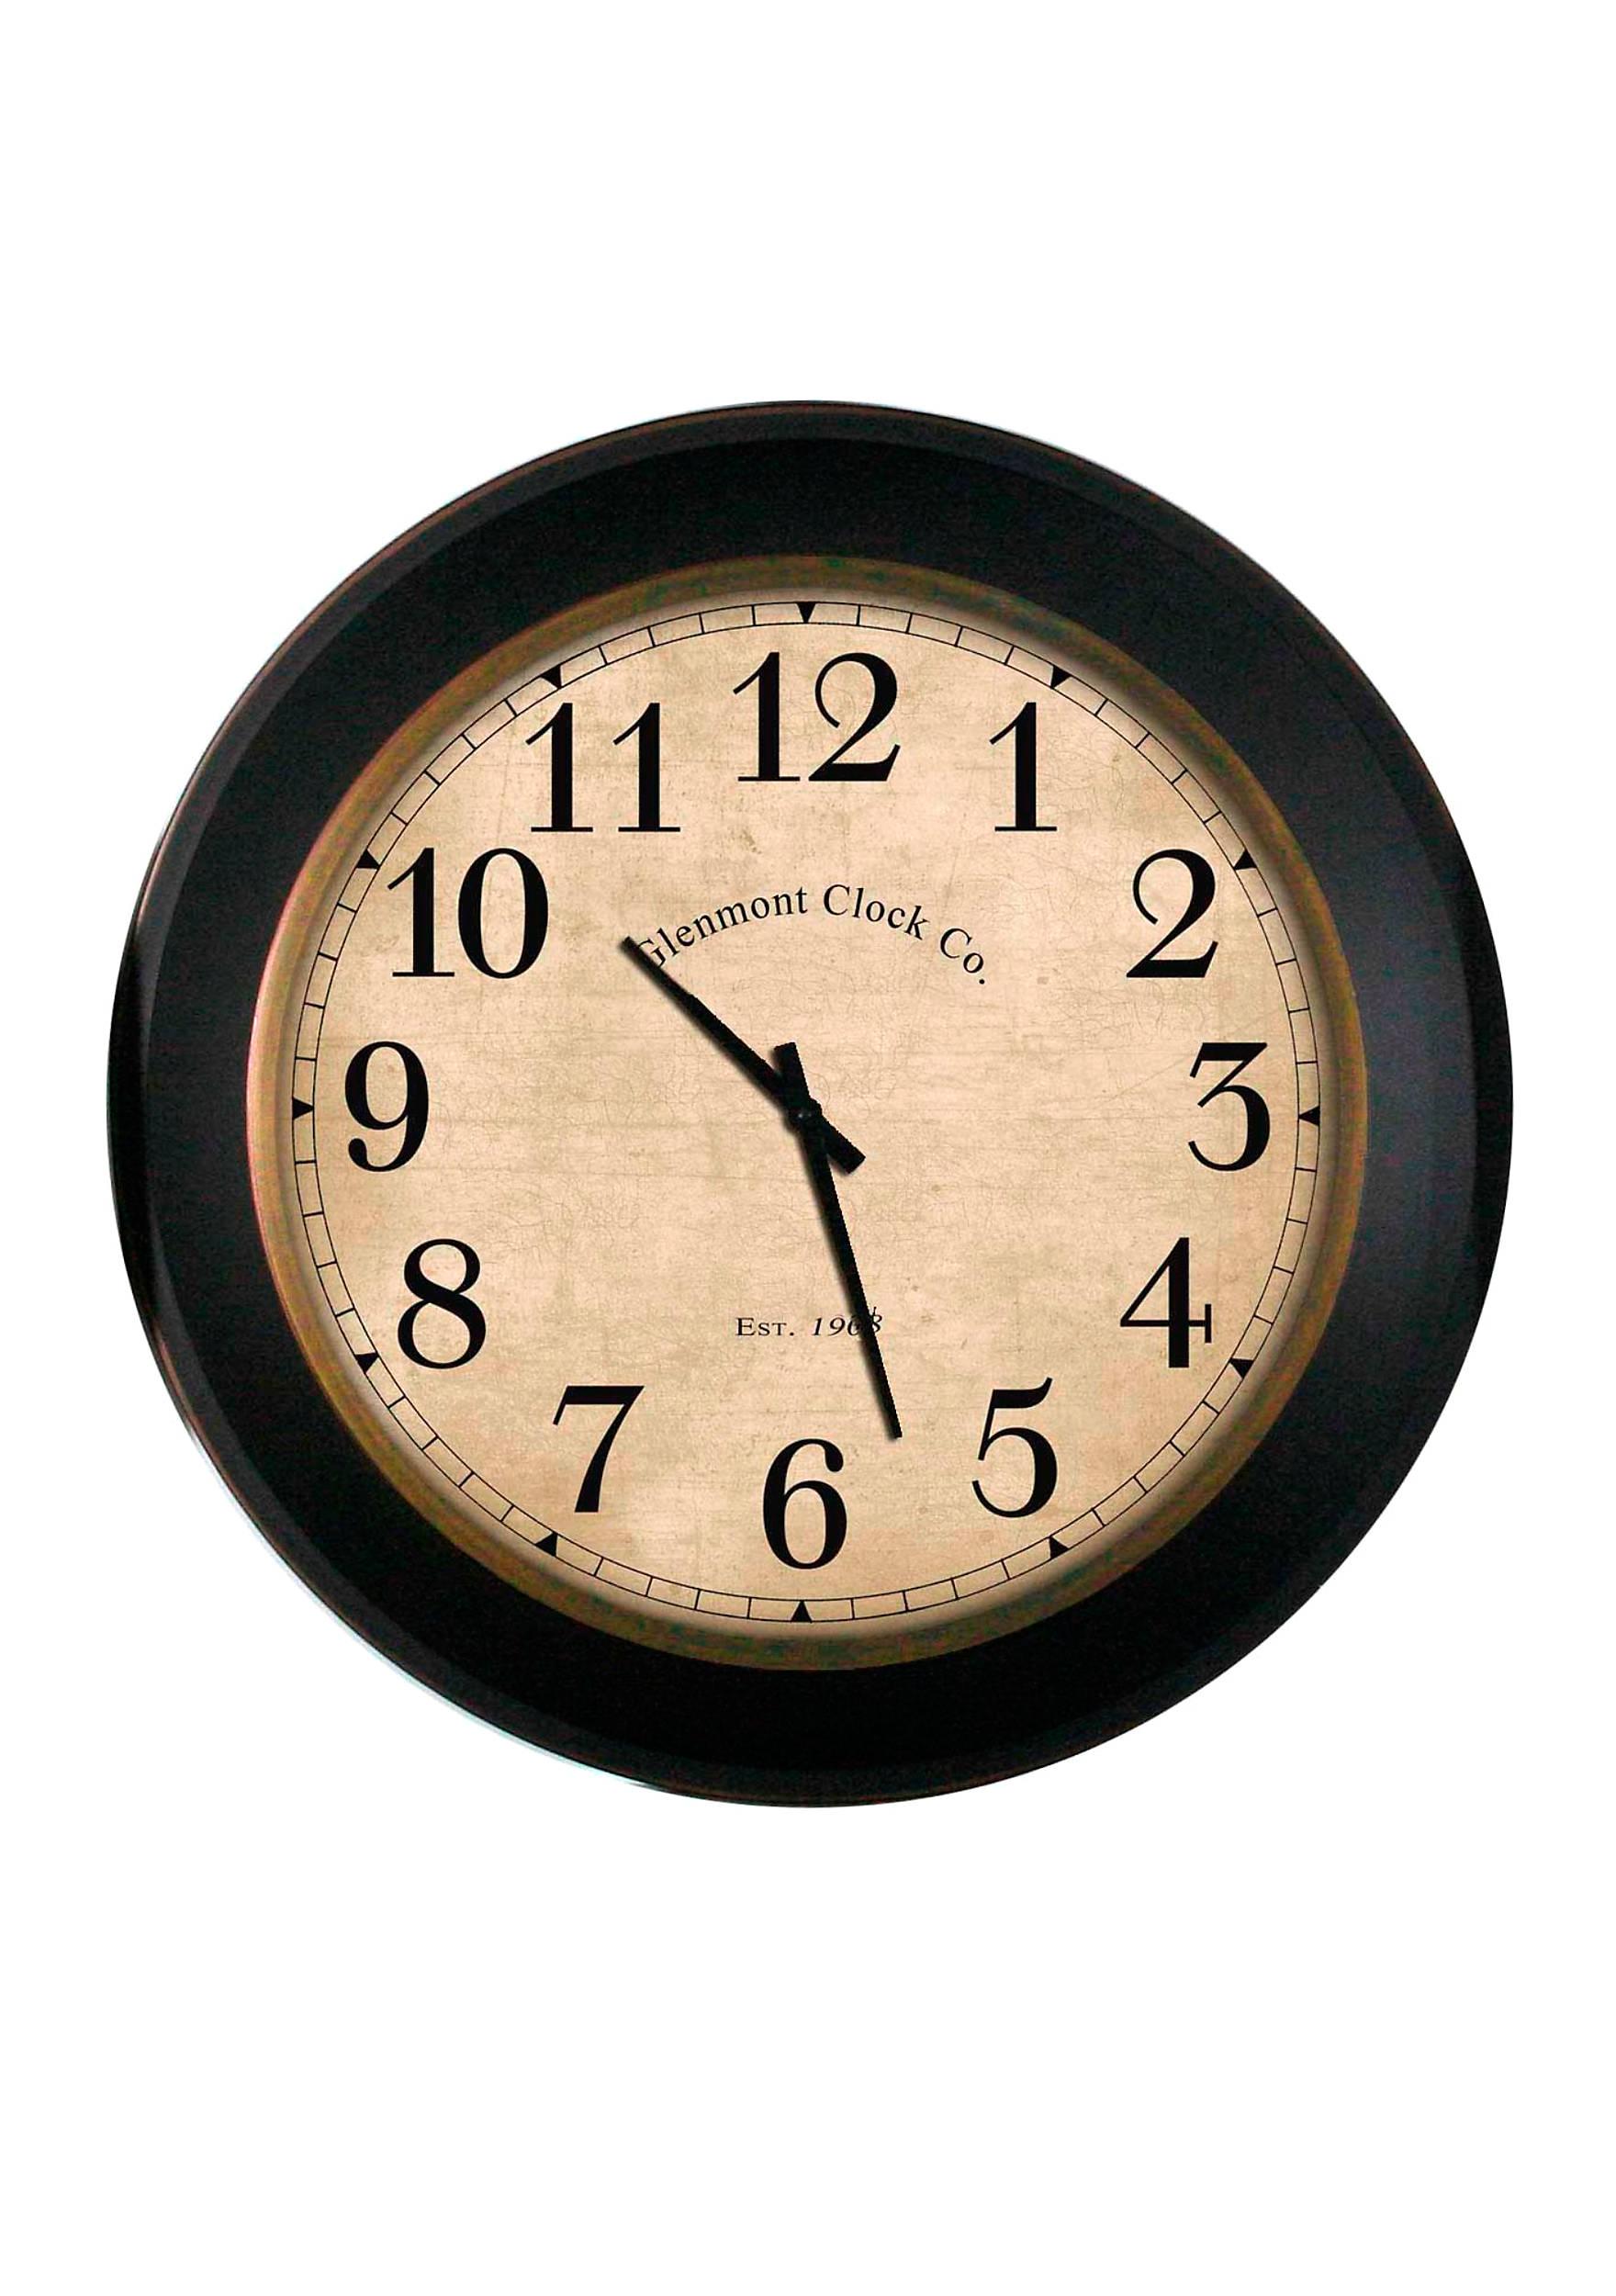 Clocks wall clocks kitchen clocks digital clocks more belk antique glenmont clock amipublicfo Choice Image